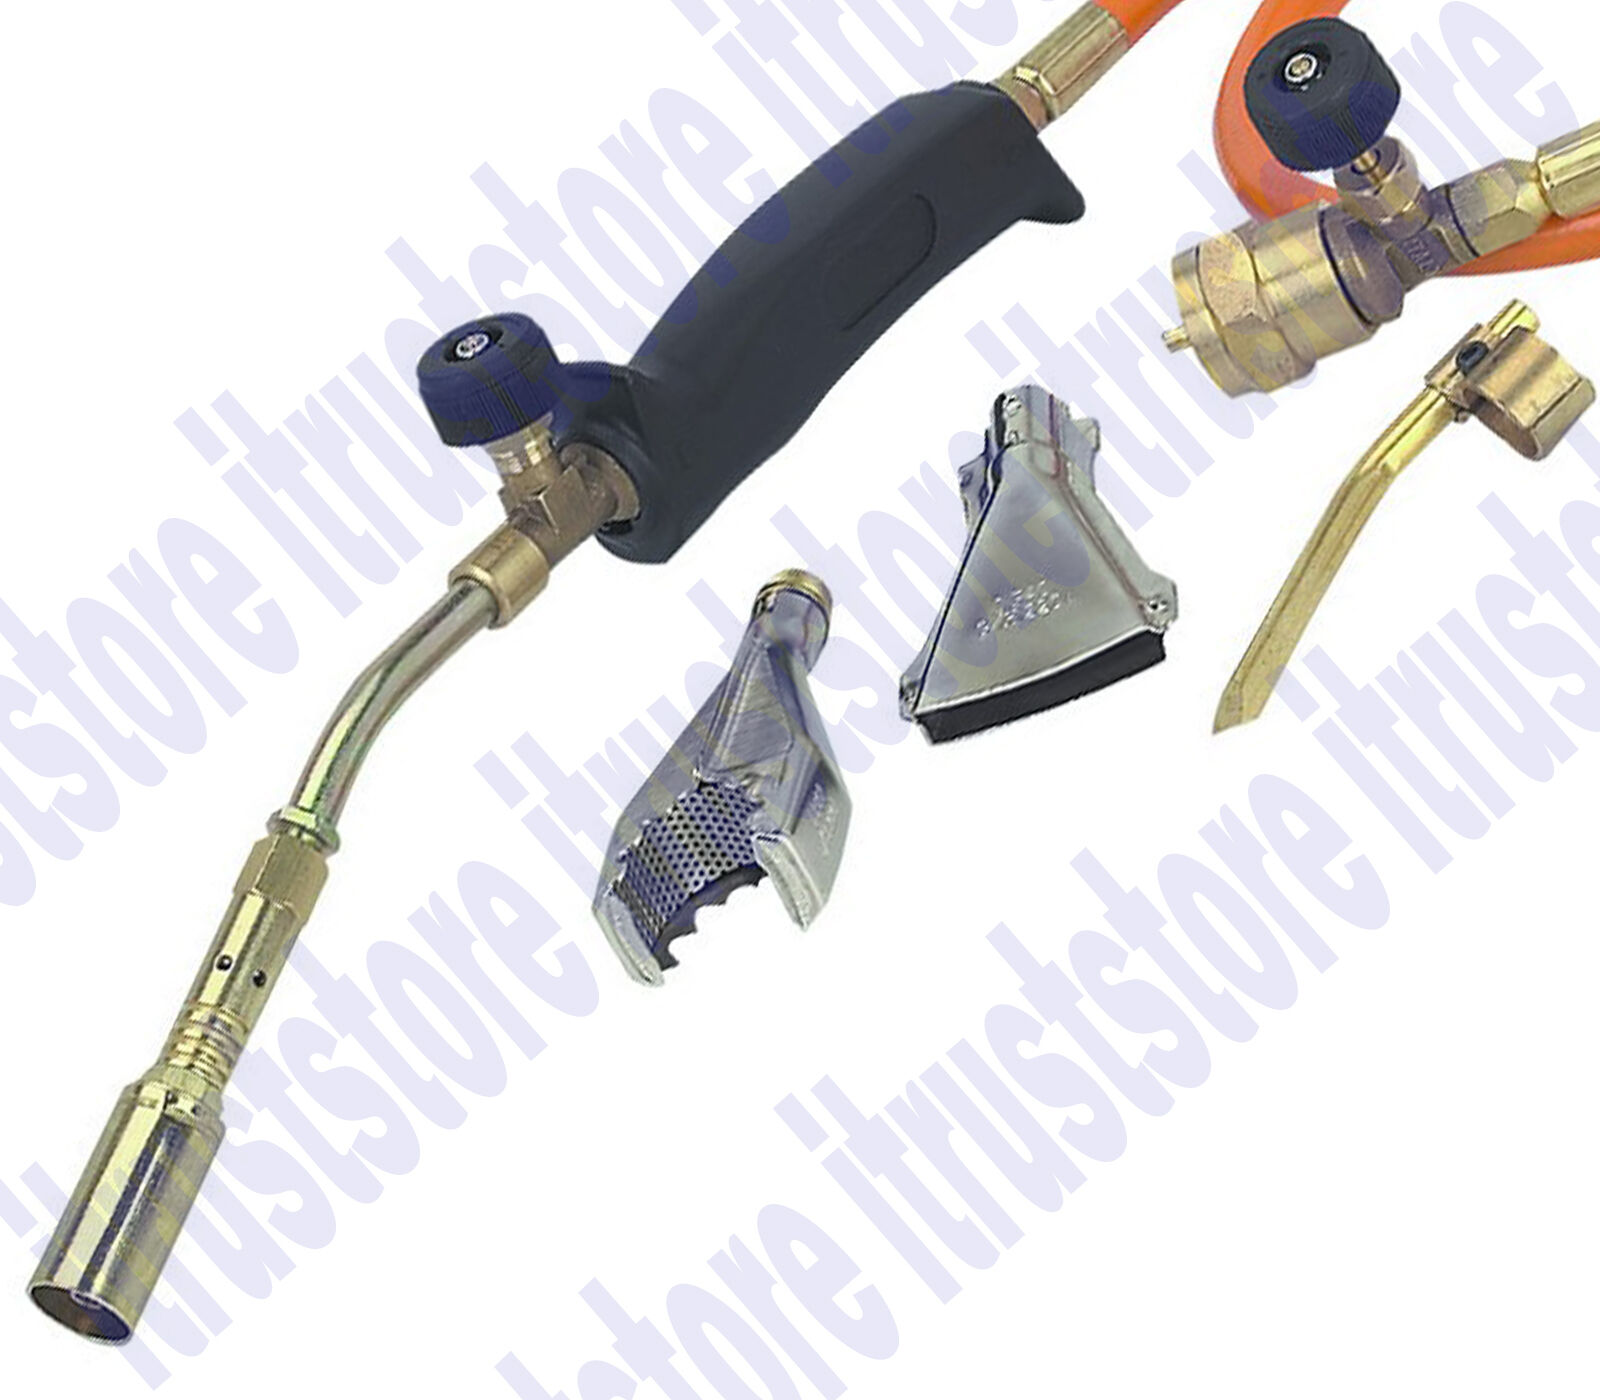 Small Mini Brazing Propane Gas Soldering Hand Torch Solder Braze Heat Heating